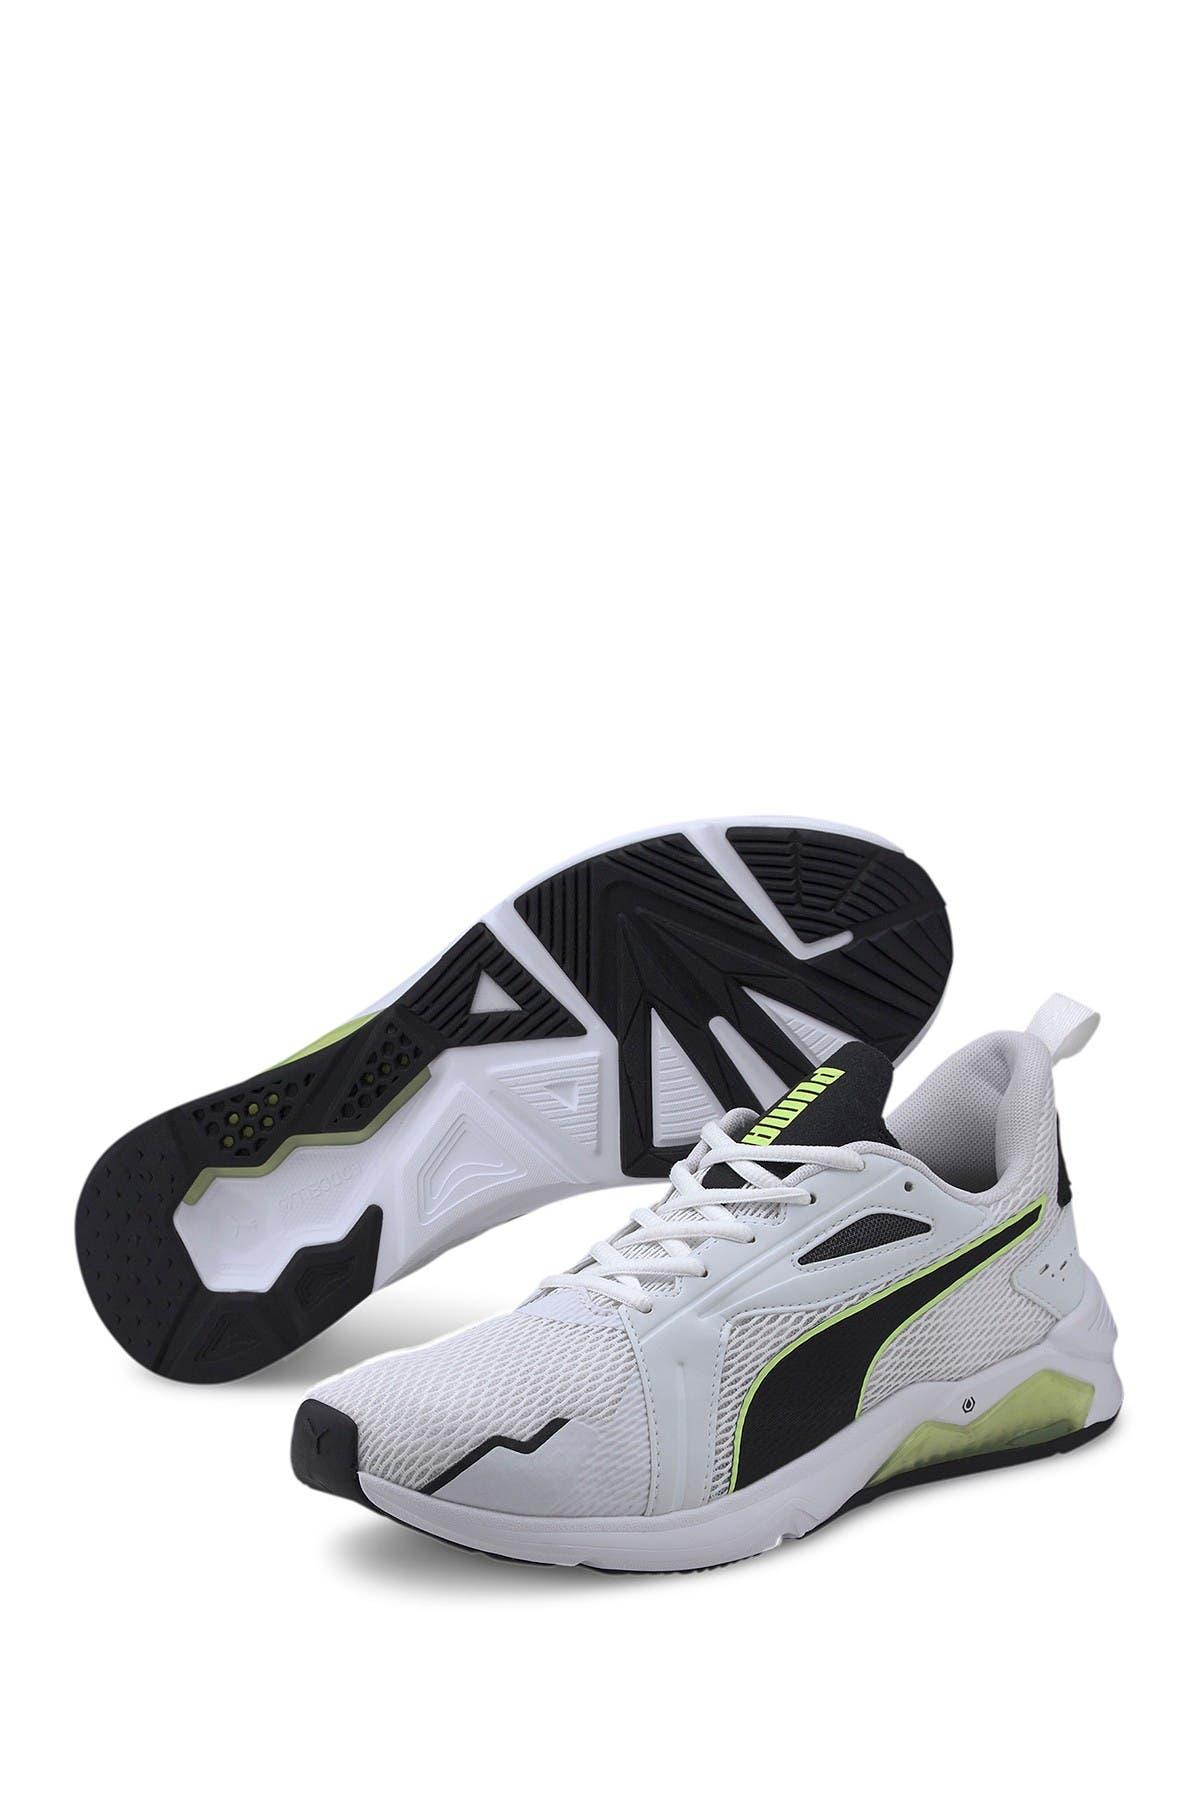 Image of PUMA LQDCELL Method Training Shoe